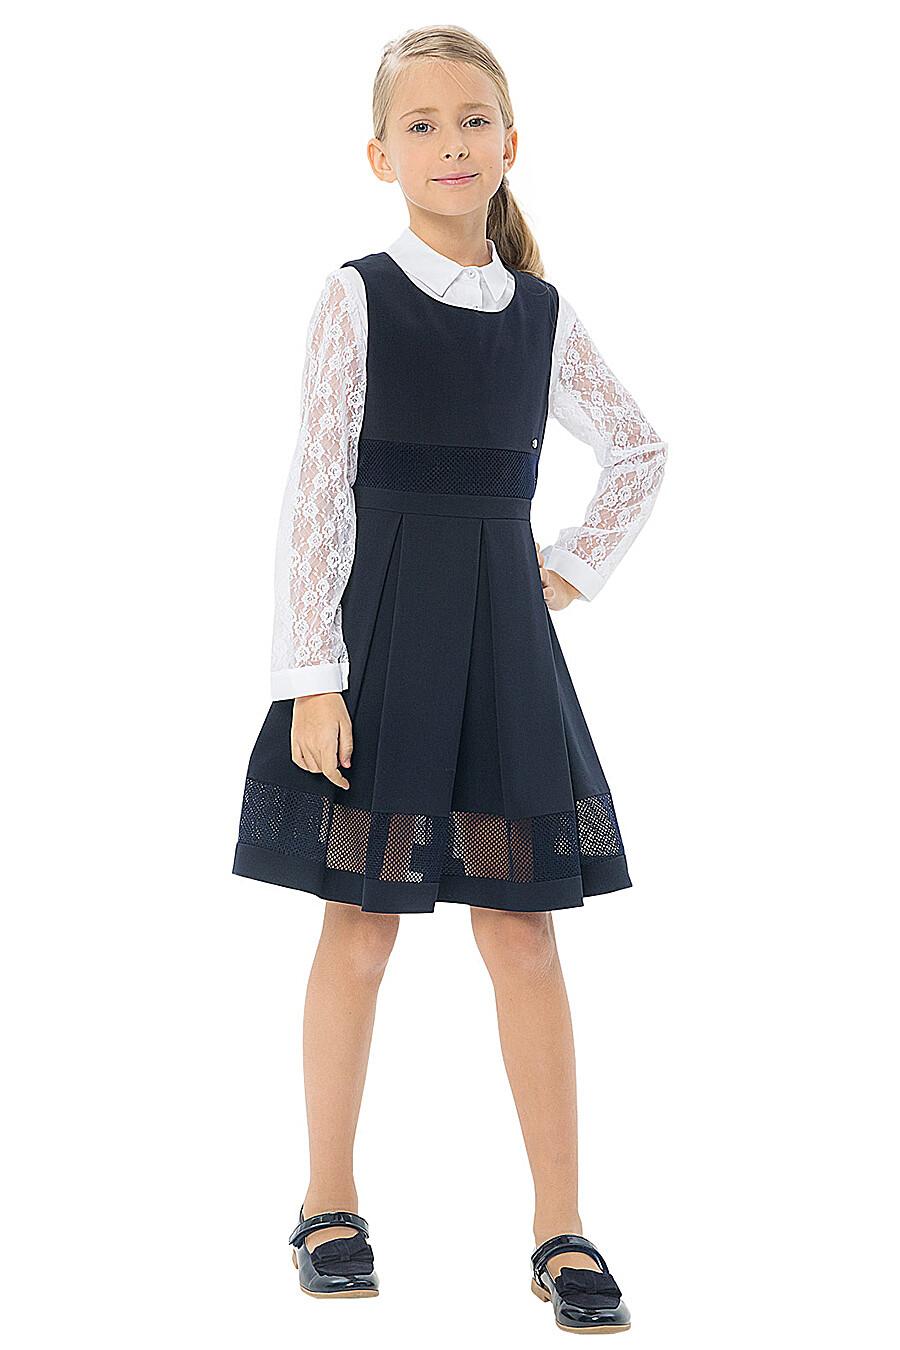 Сарафан КАРАМЕЛЛИ (683309), купить в Moyo.moda